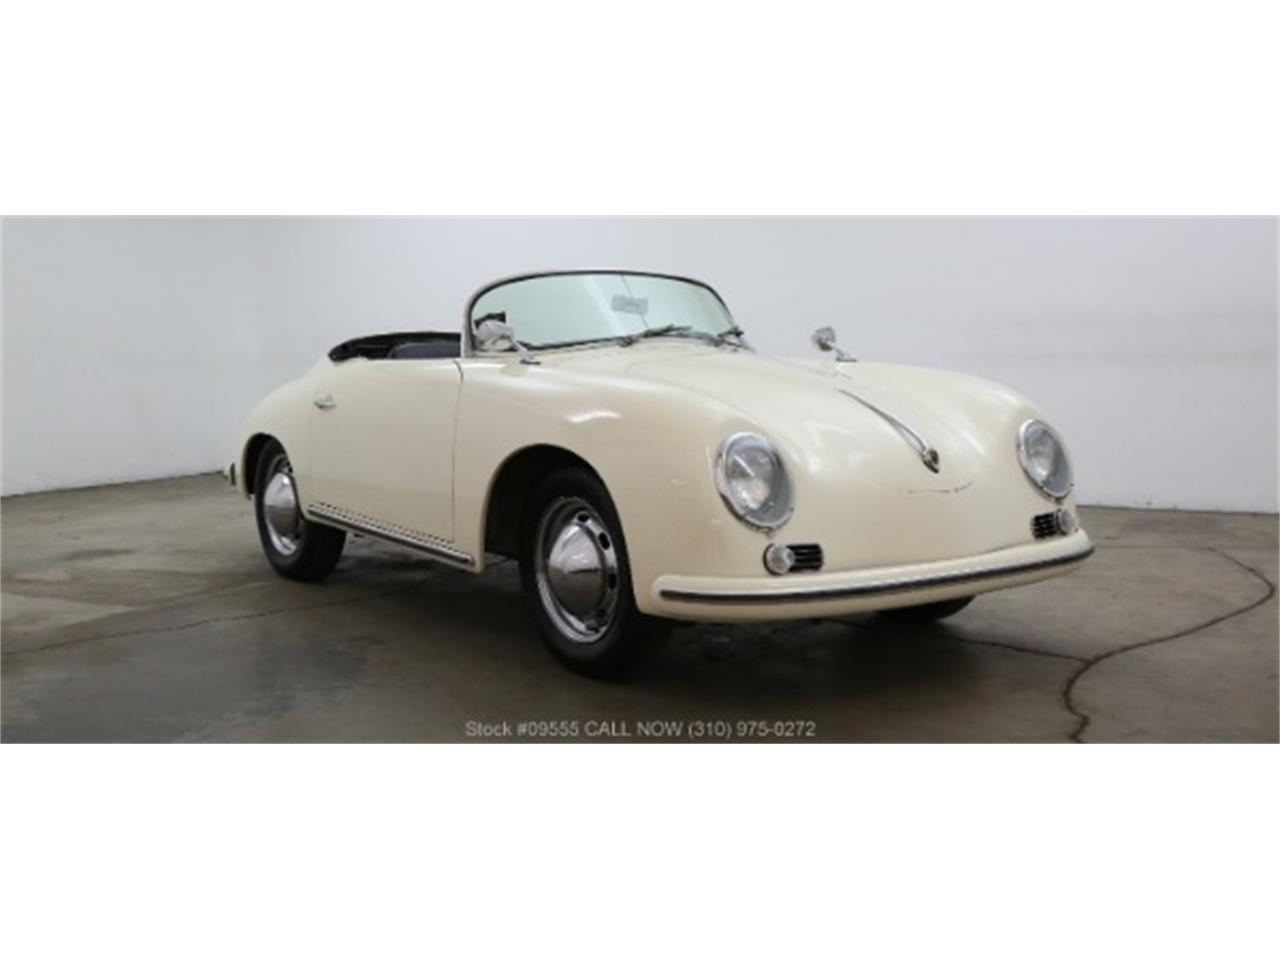 Classic Porsche Speedster for Sale on ClassicCars.com